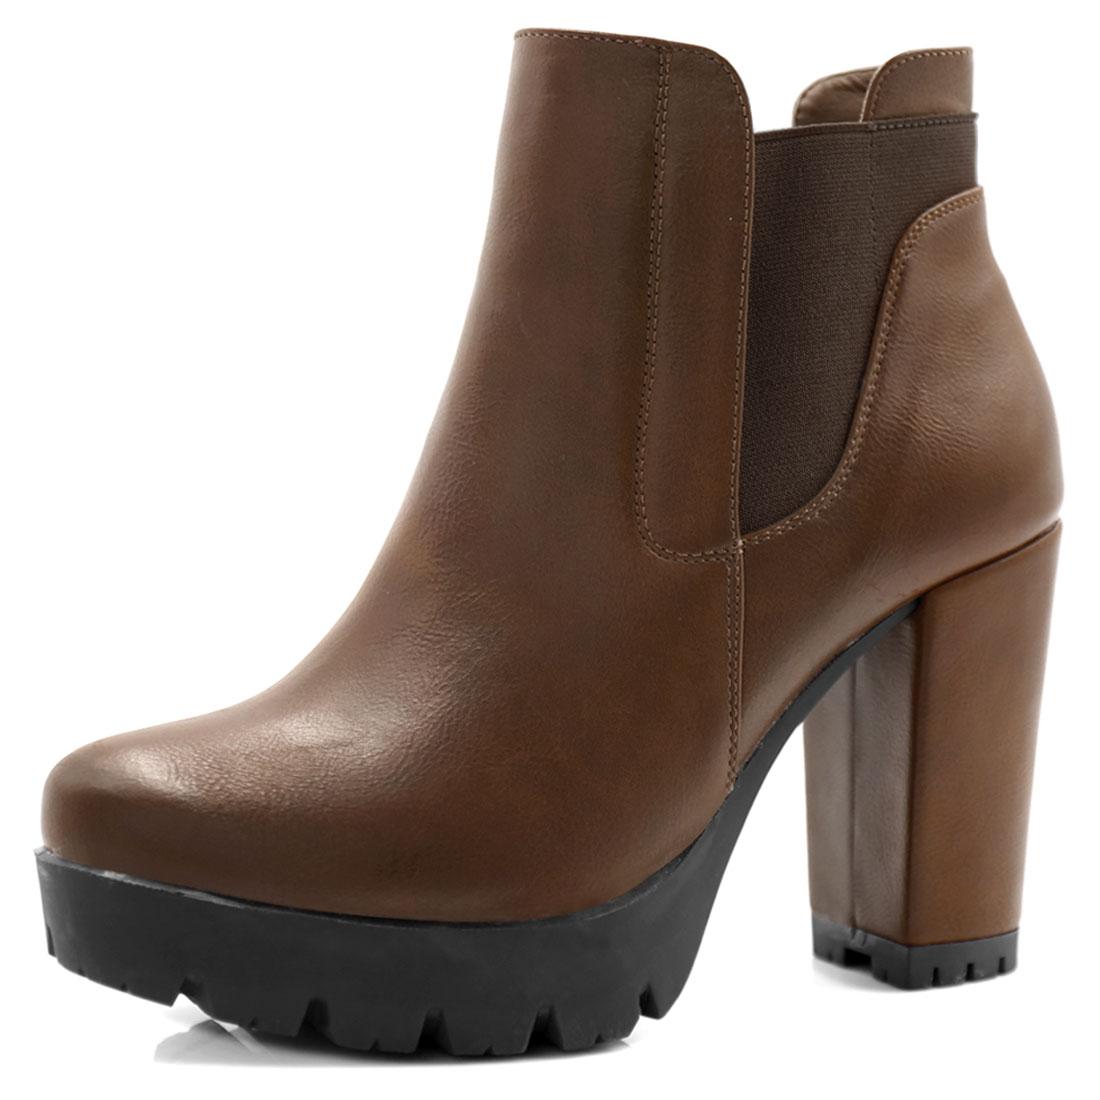 Women Chunky High Heel Platform Zipper Chelsea Boots Brown US 8.5